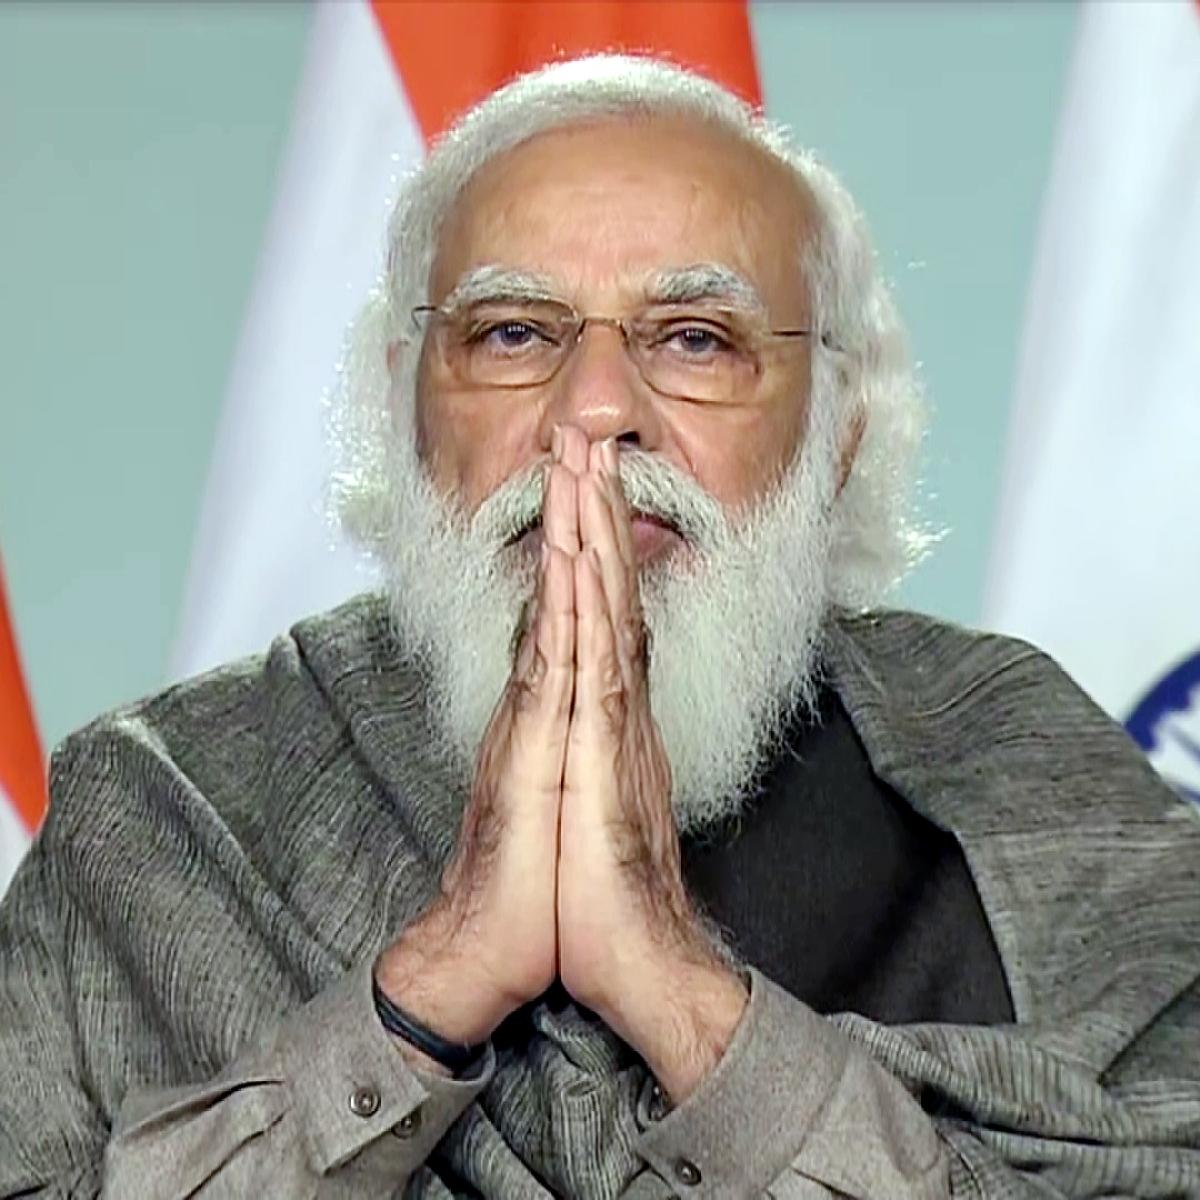 PM Modi to inaugurate Chauri Chaura centenary celebrations on 4 February via video conferencing